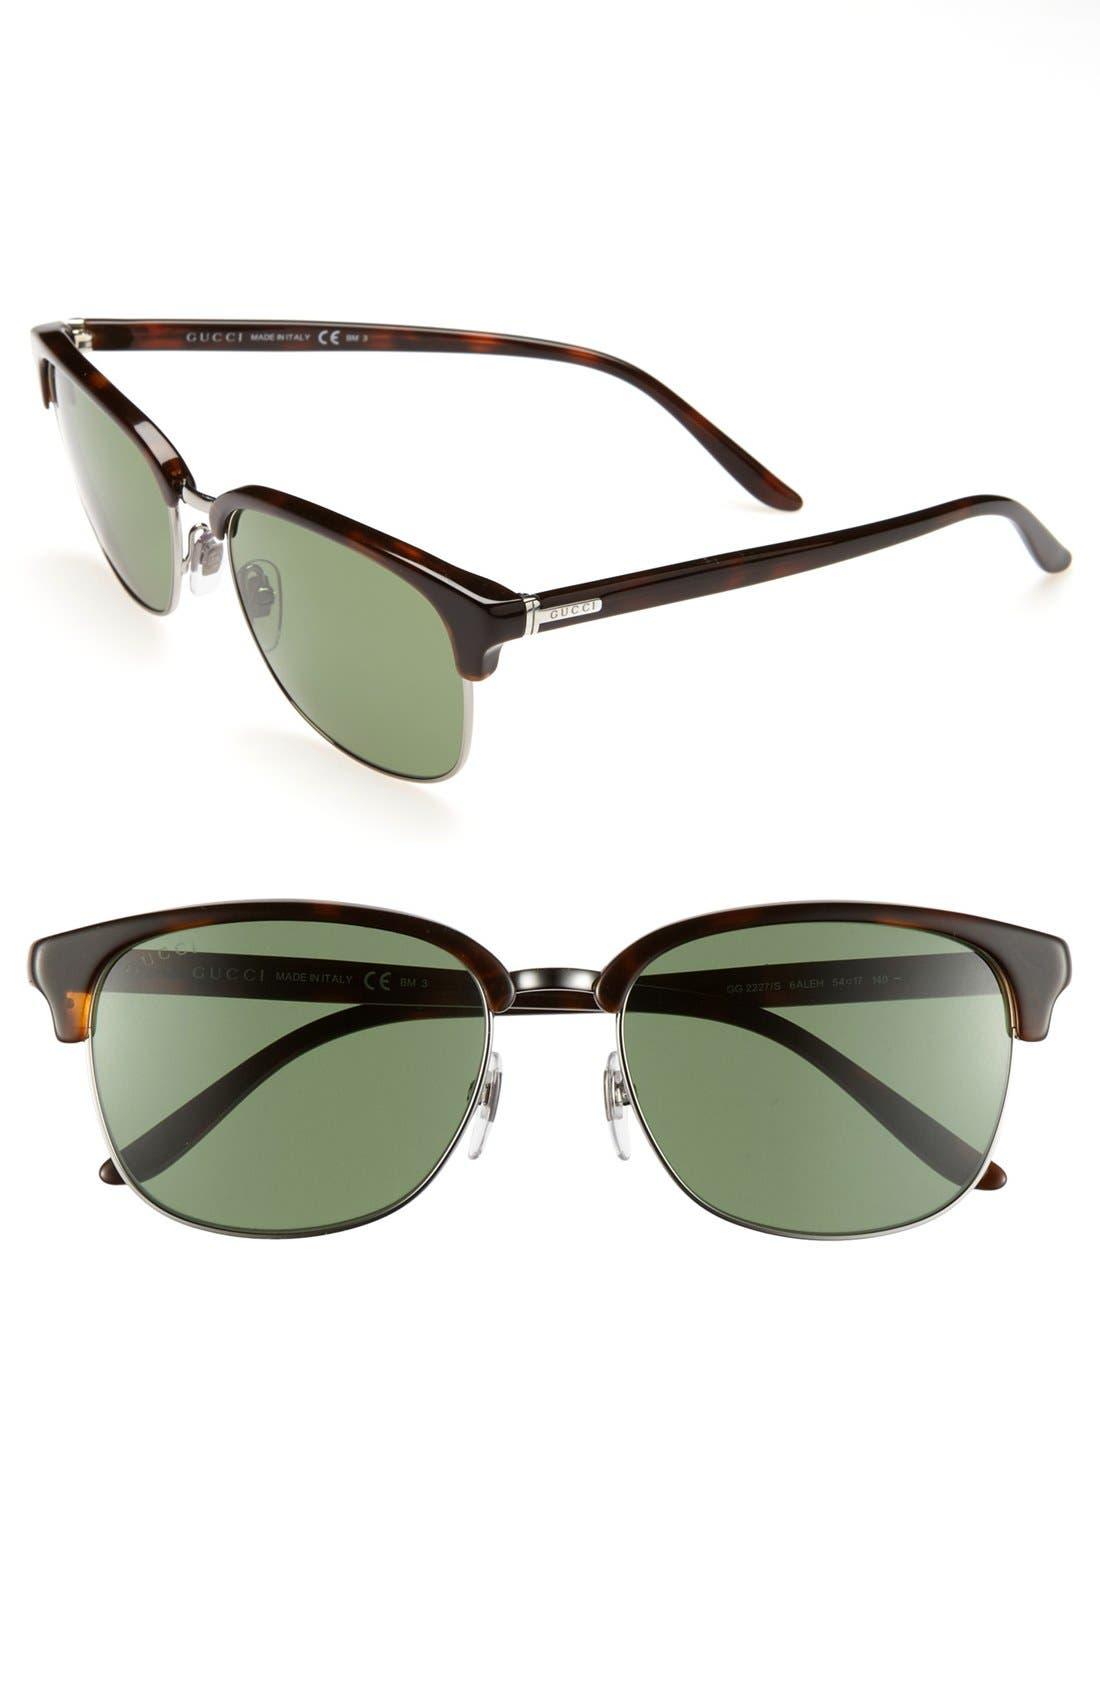 Main Image - Gucci 54mm Sunglasses